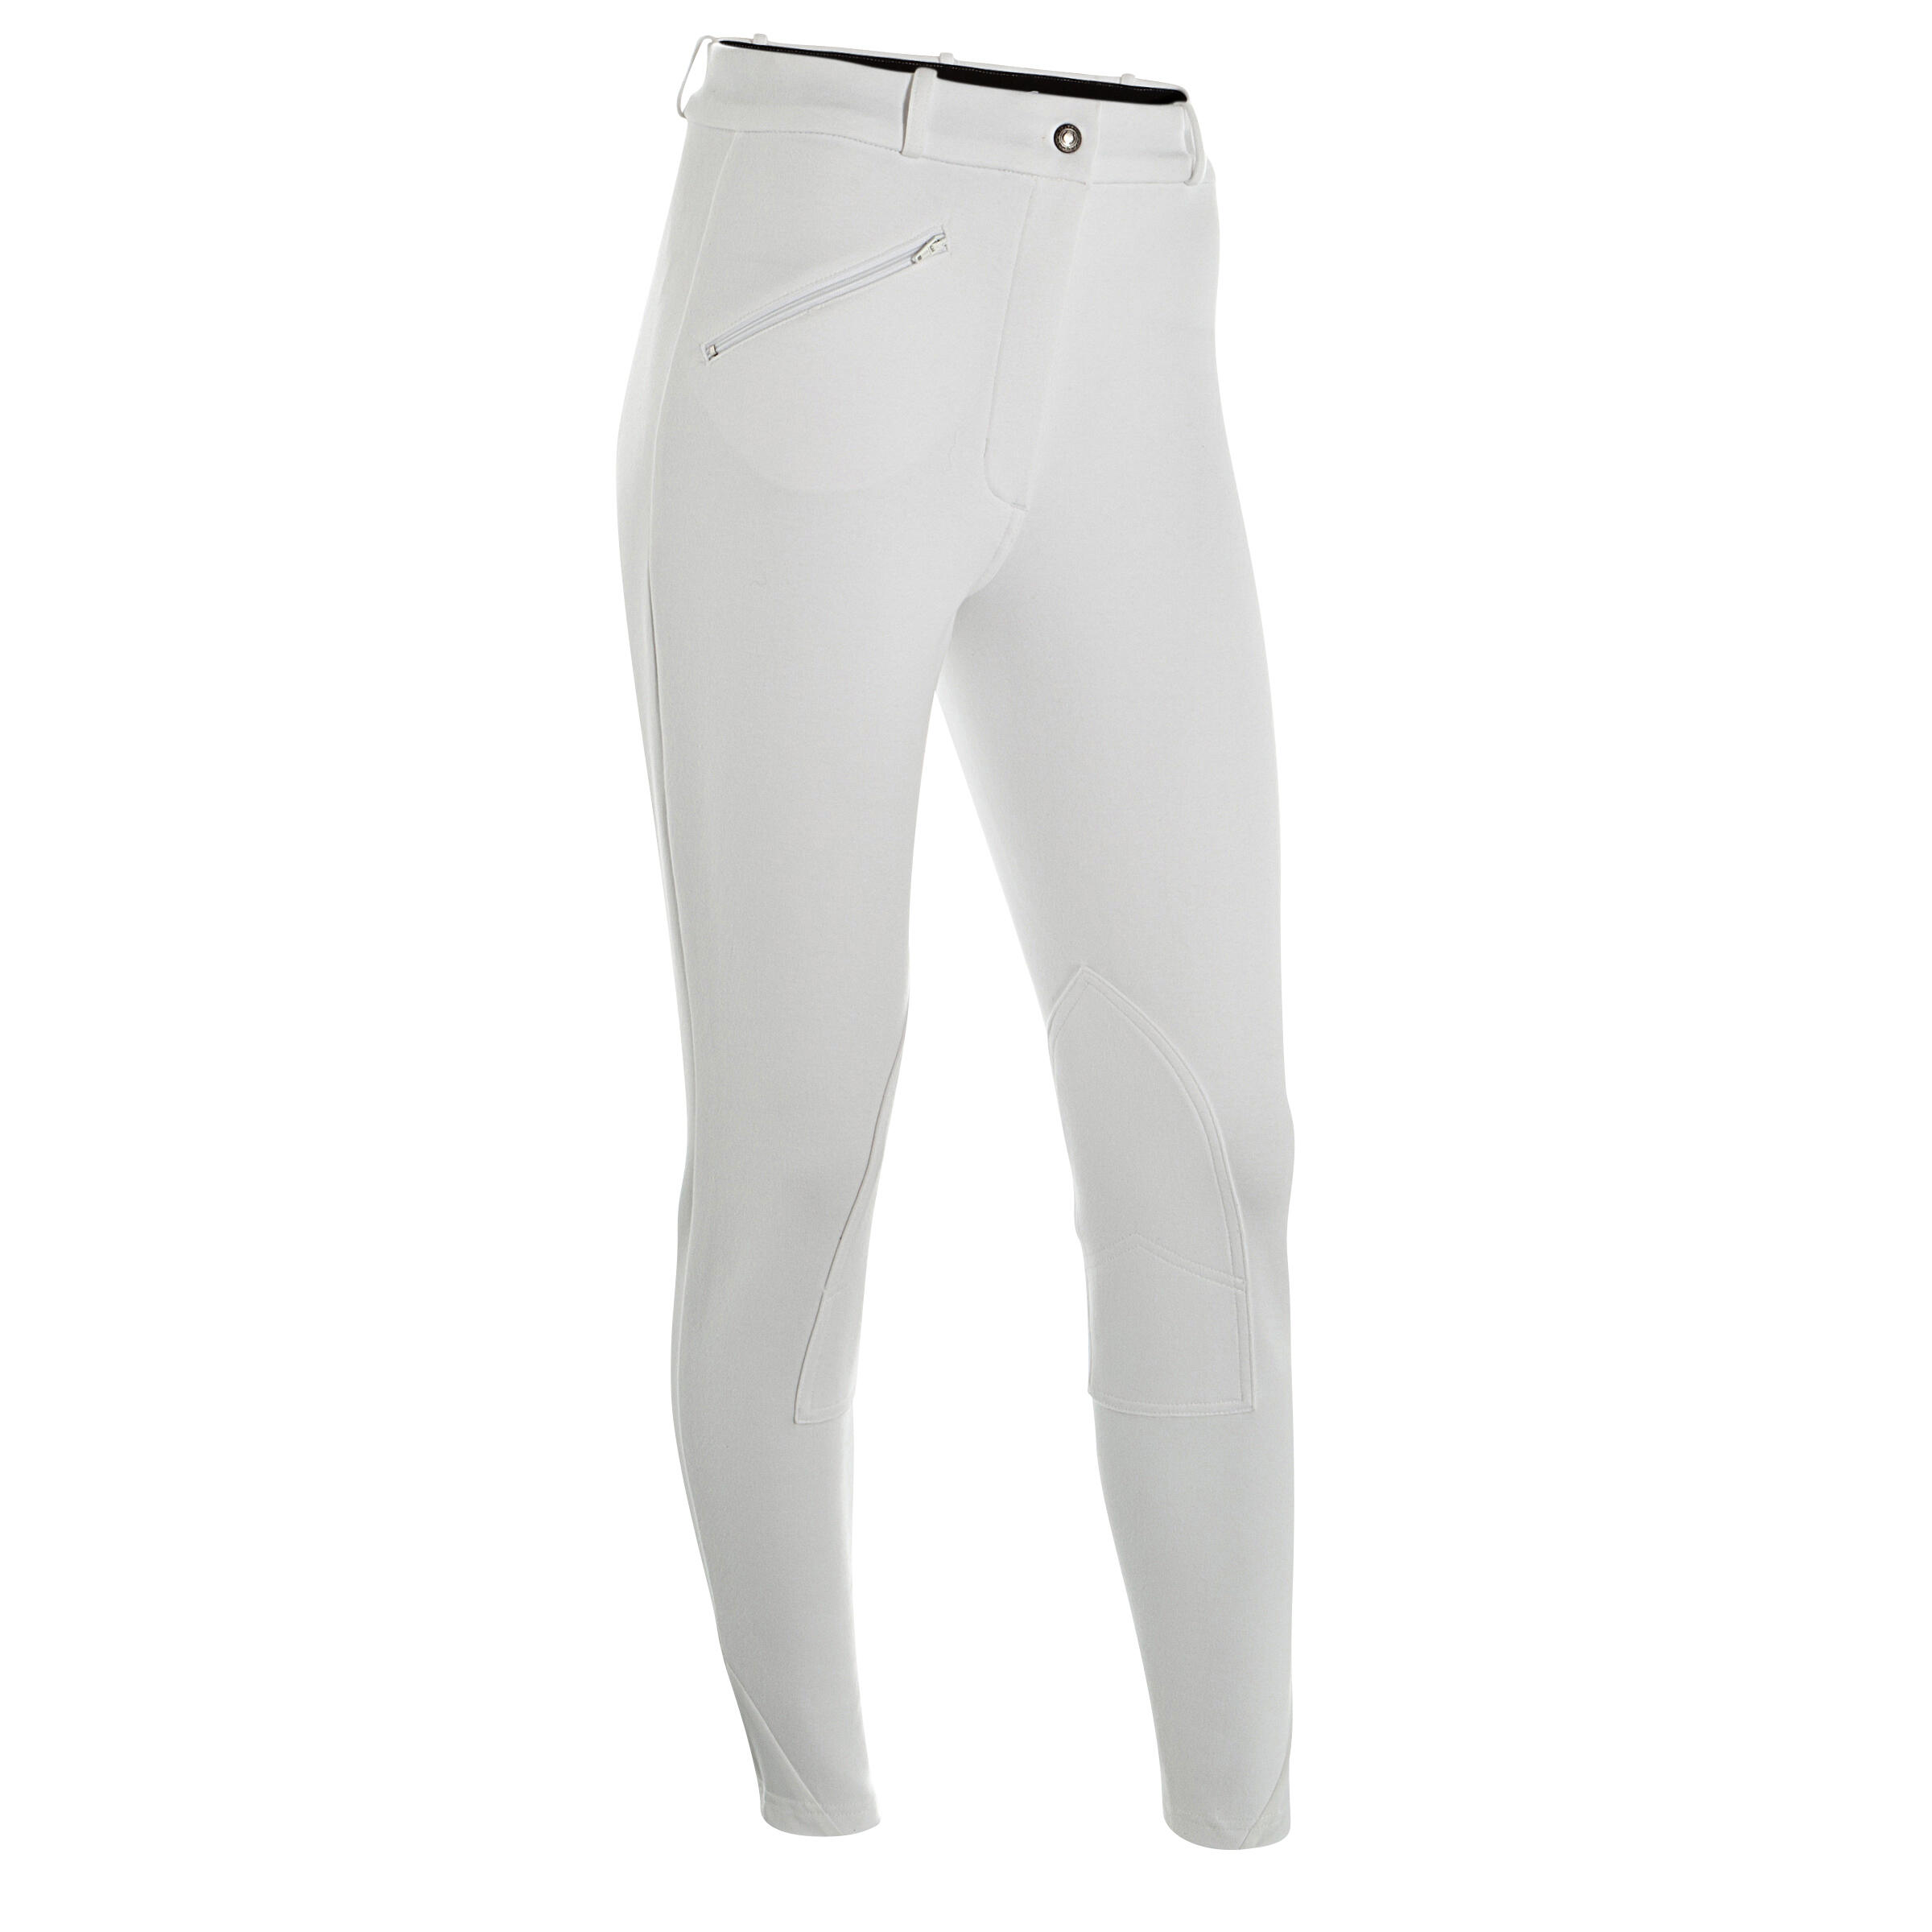 Fouganza Wedstrijdbroek BR100 voor dames ruitersport wit